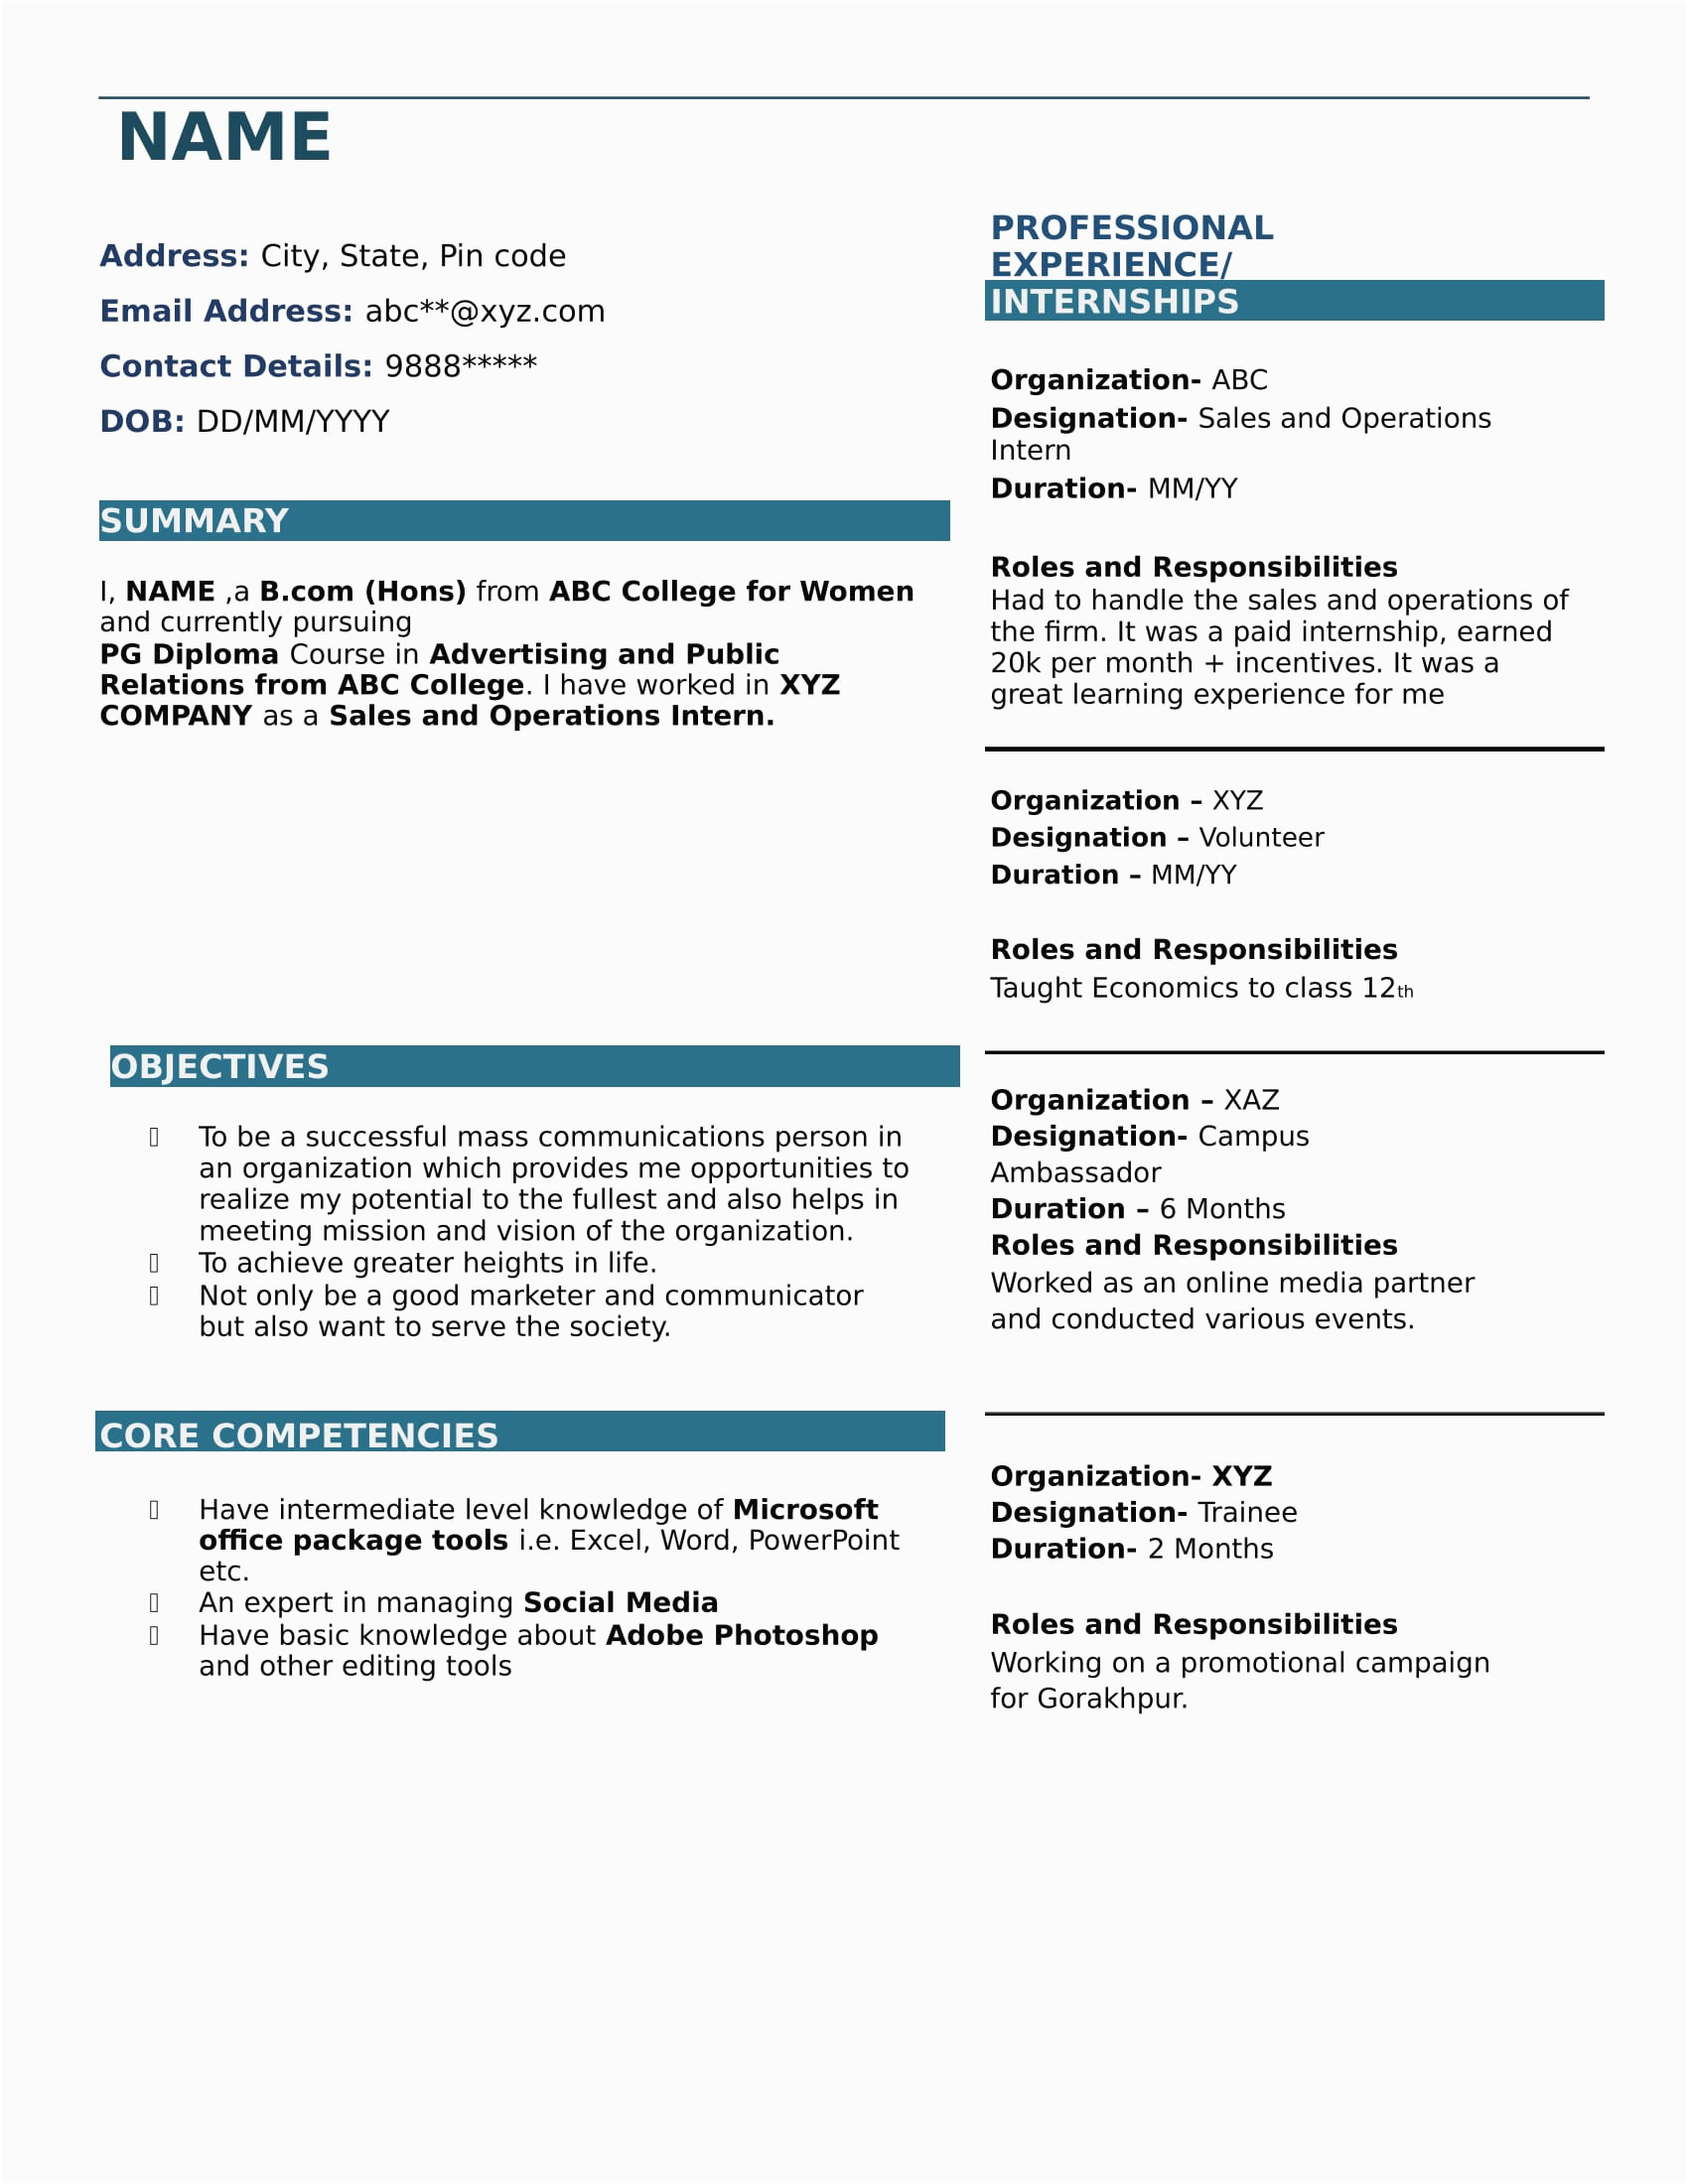 Resume Samples for B Com Freshers Download B Fresher Resume format Download